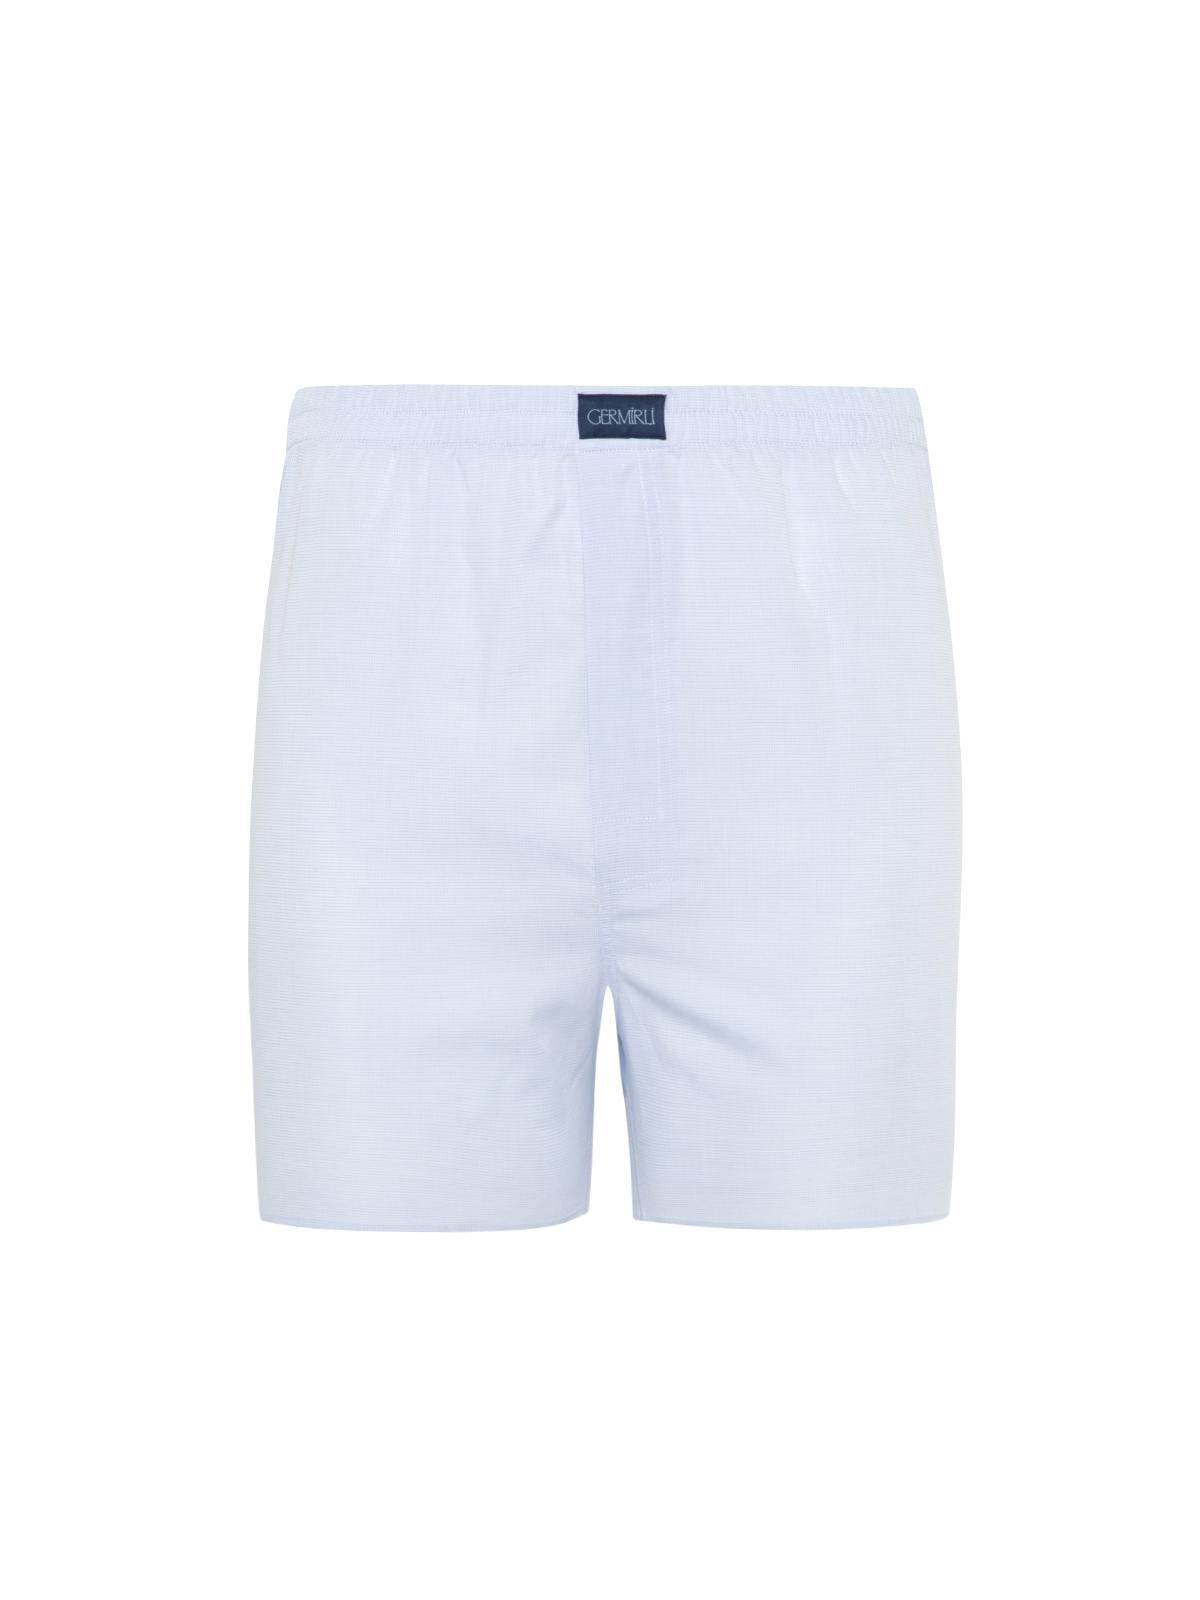 Germirli - Germirli Mavi Beyaz Piti Kareli Pamuk Boxer Şort